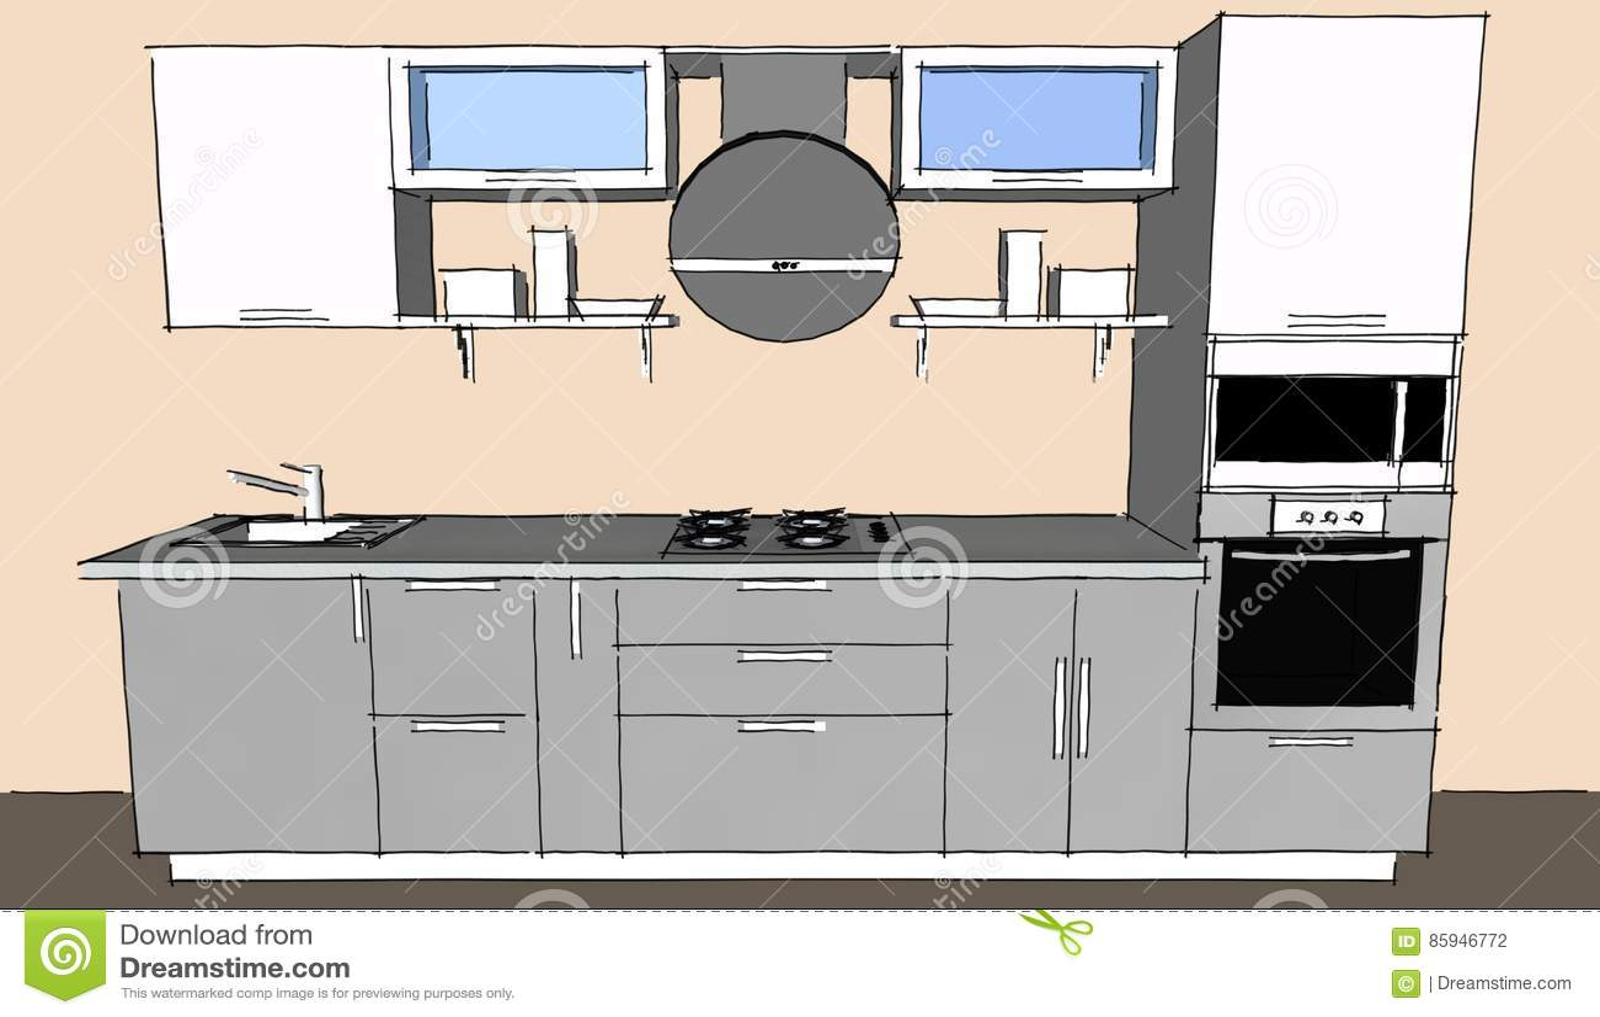 Programma per disegnare cucine good skyline sala for Programma per progettare cucine gratis